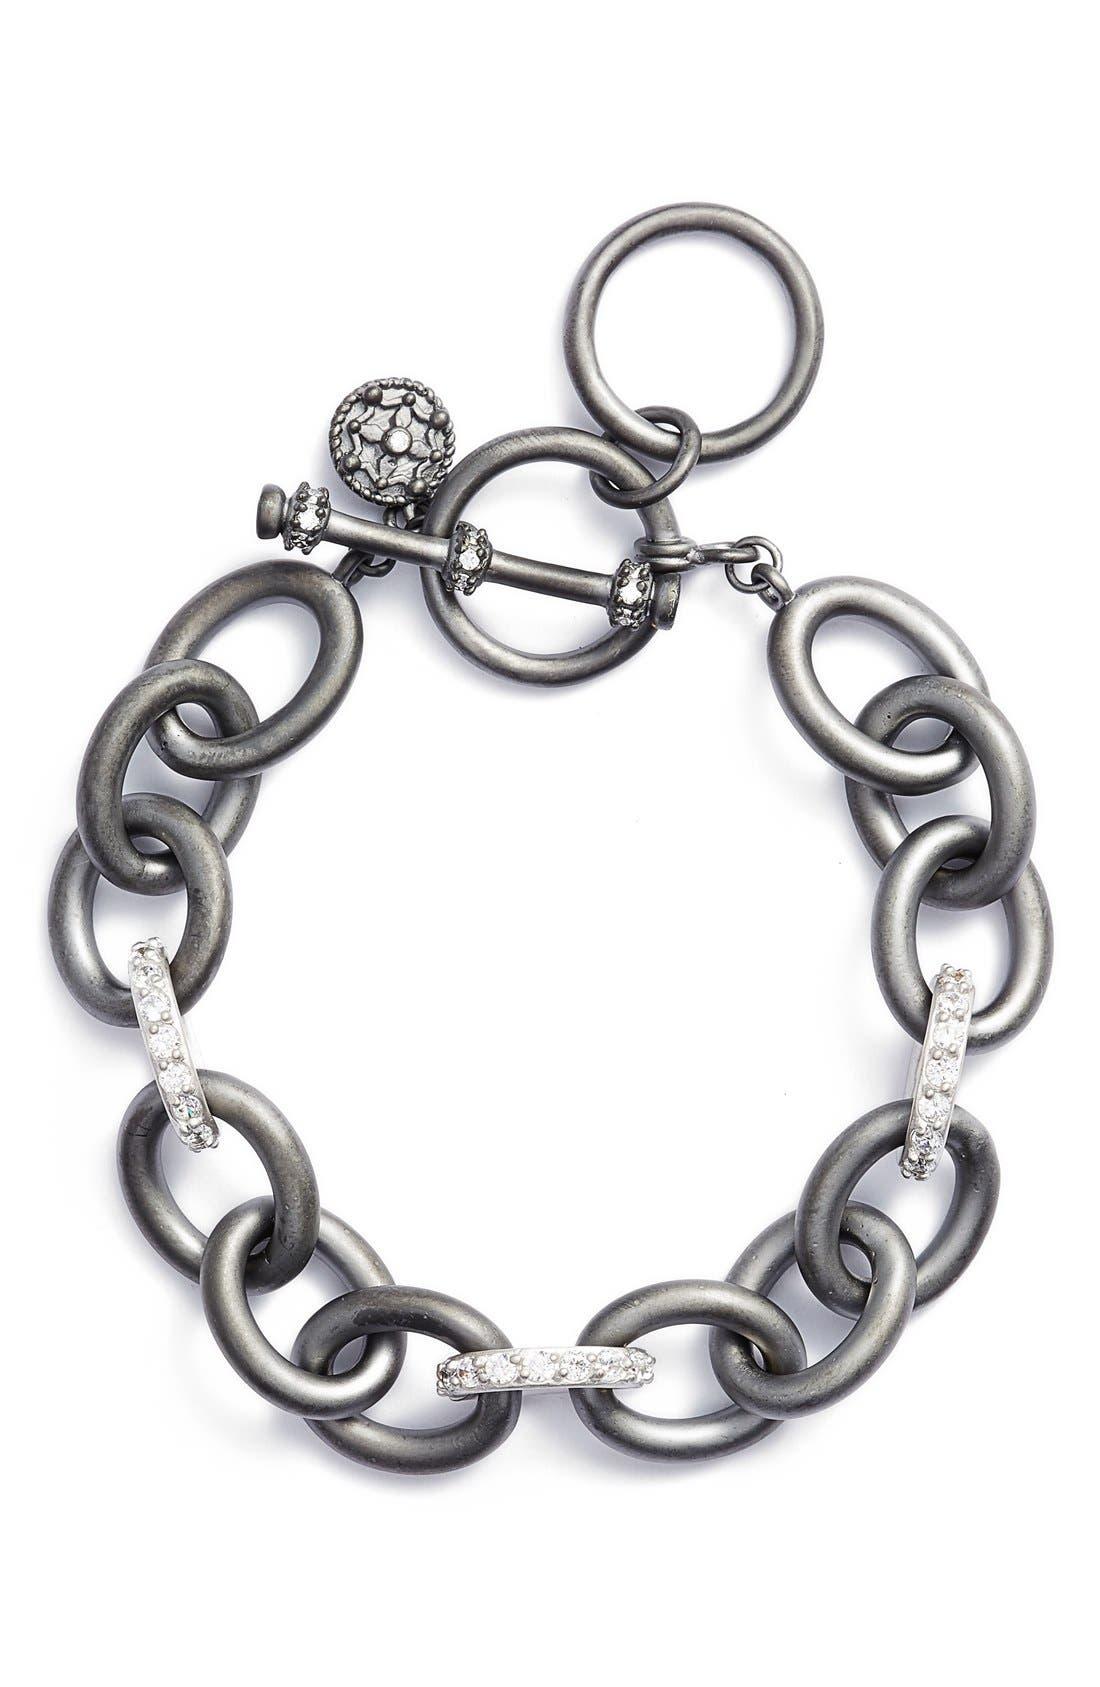 Contemporary Deco Heavy Chain Bracelet,                             Main thumbnail 1, color,                             GUNMETAL/ SILVER